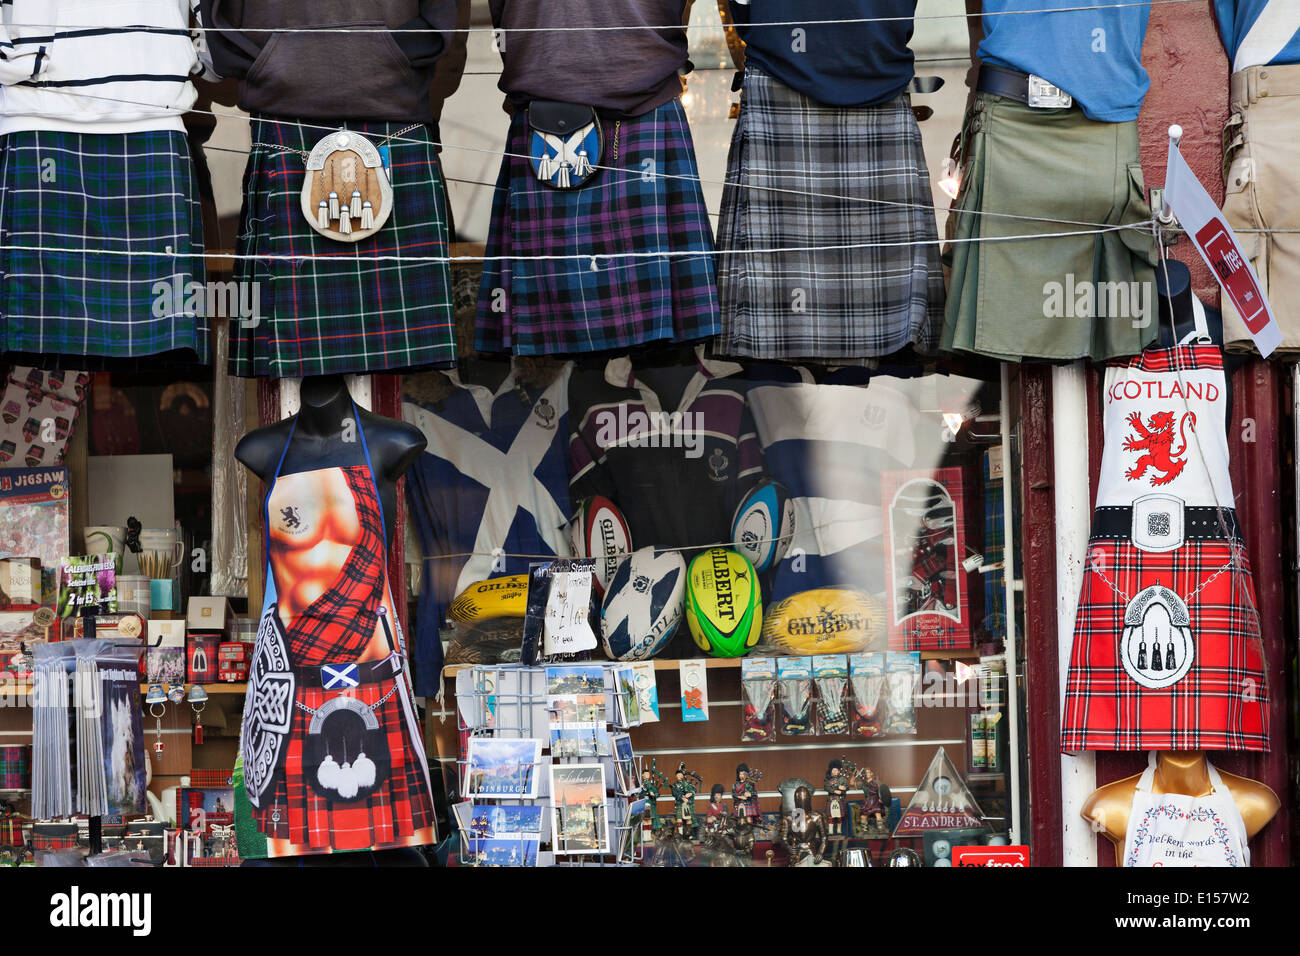 Kilts and tartan outside a Scottish souvenir shop on the Royal Mile, Edinburgh - Stock Image